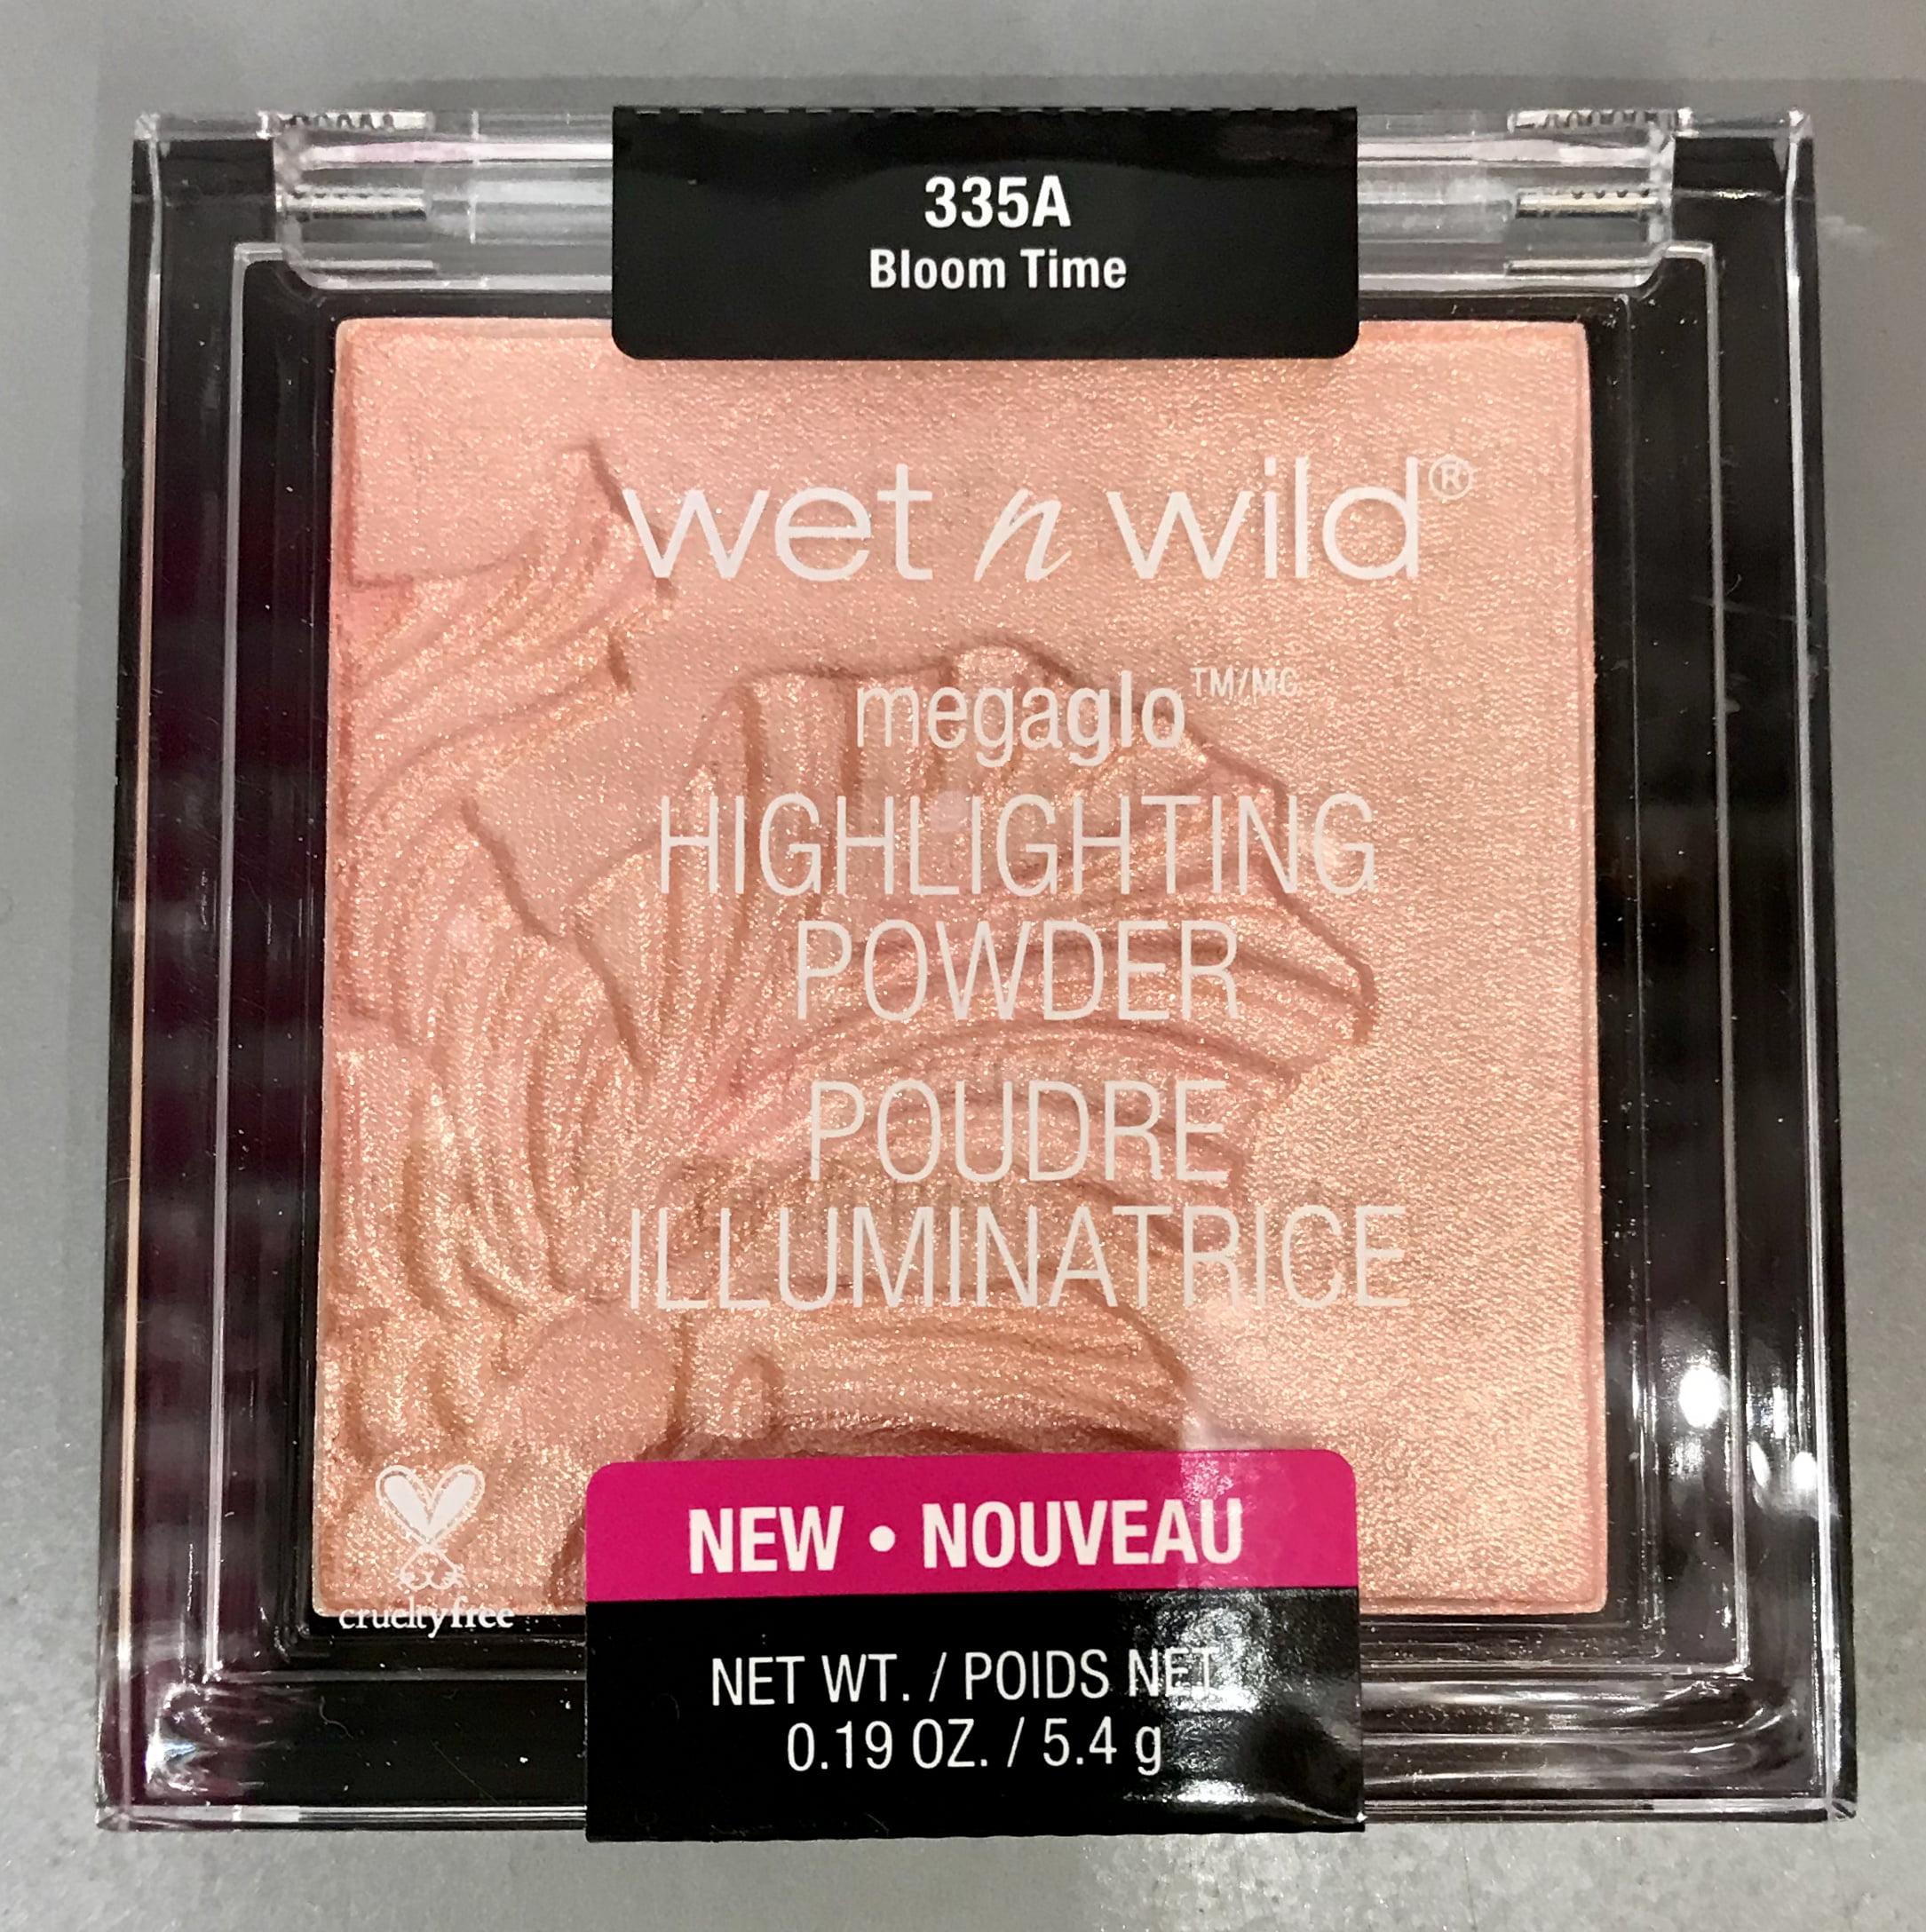 Wet N Wild 1 Highlighting Powder